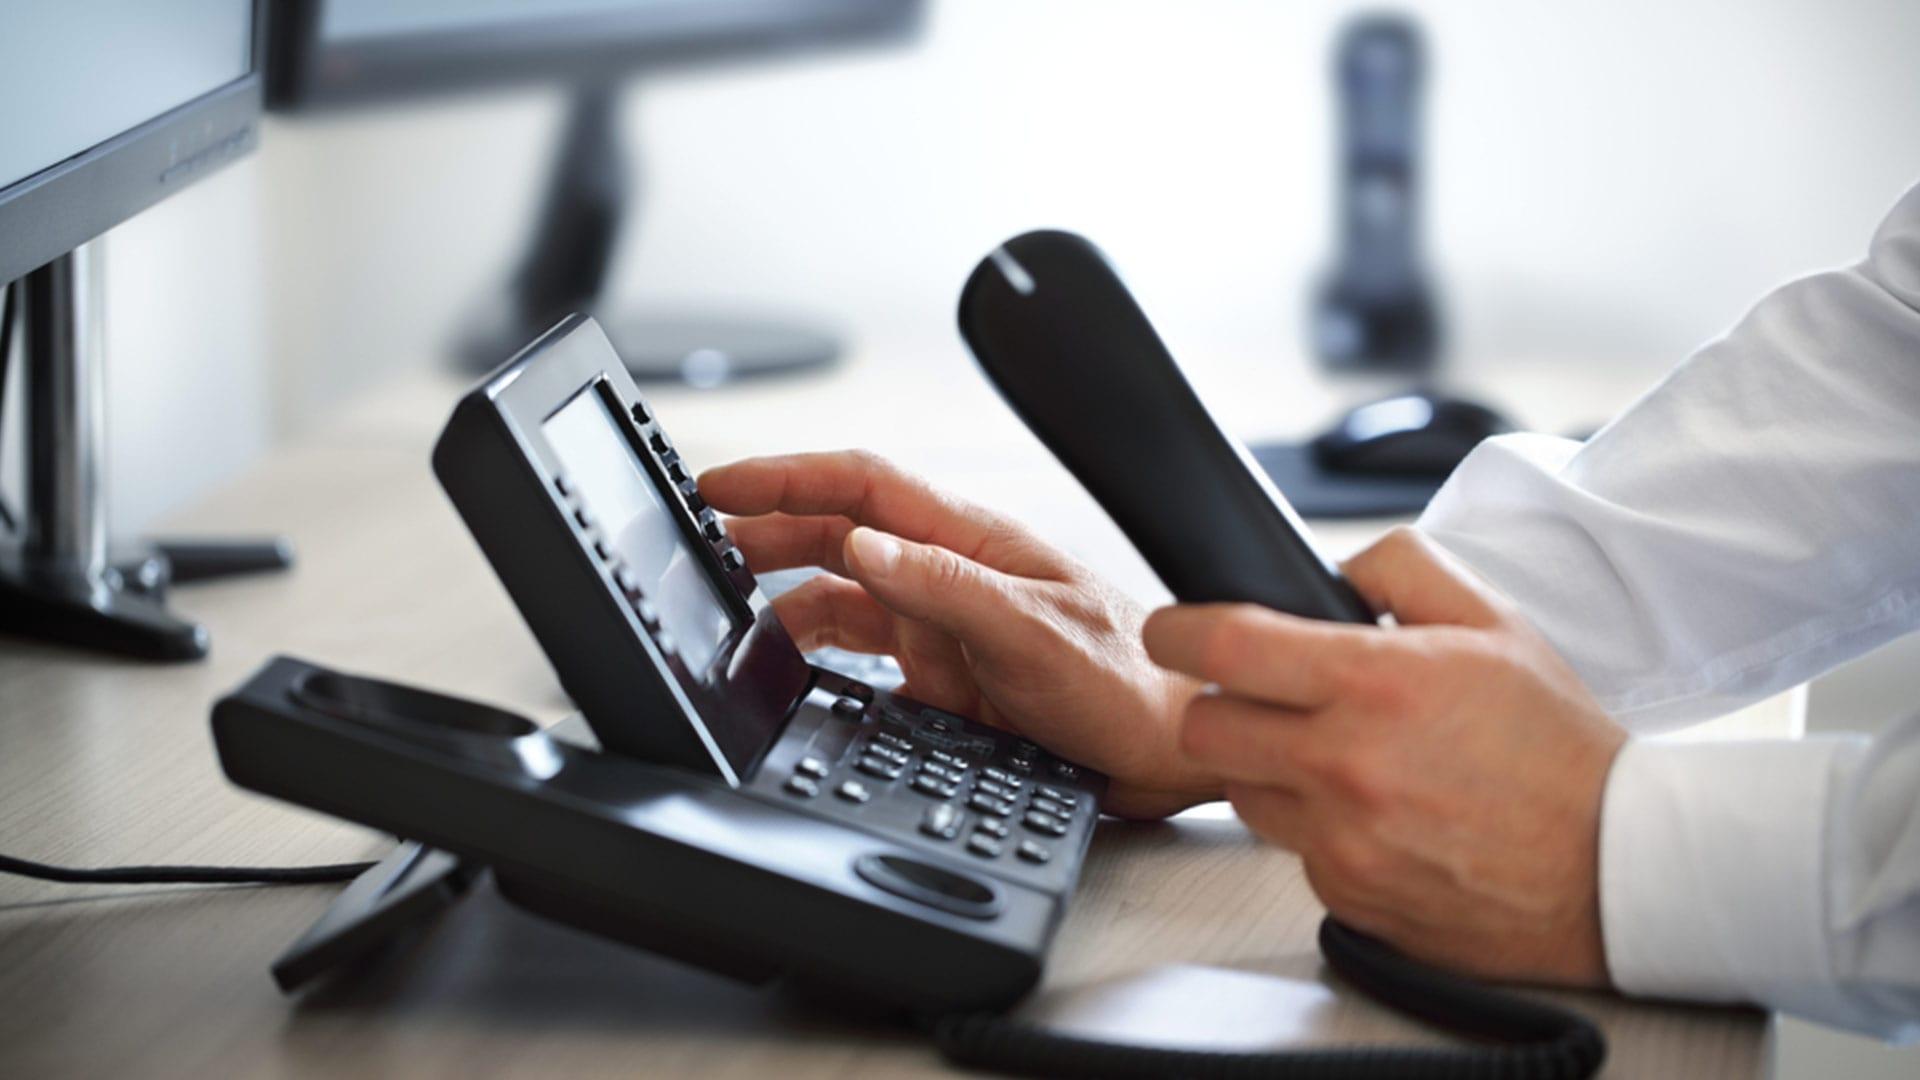 choisir-telephonie-fixe-professionnelle